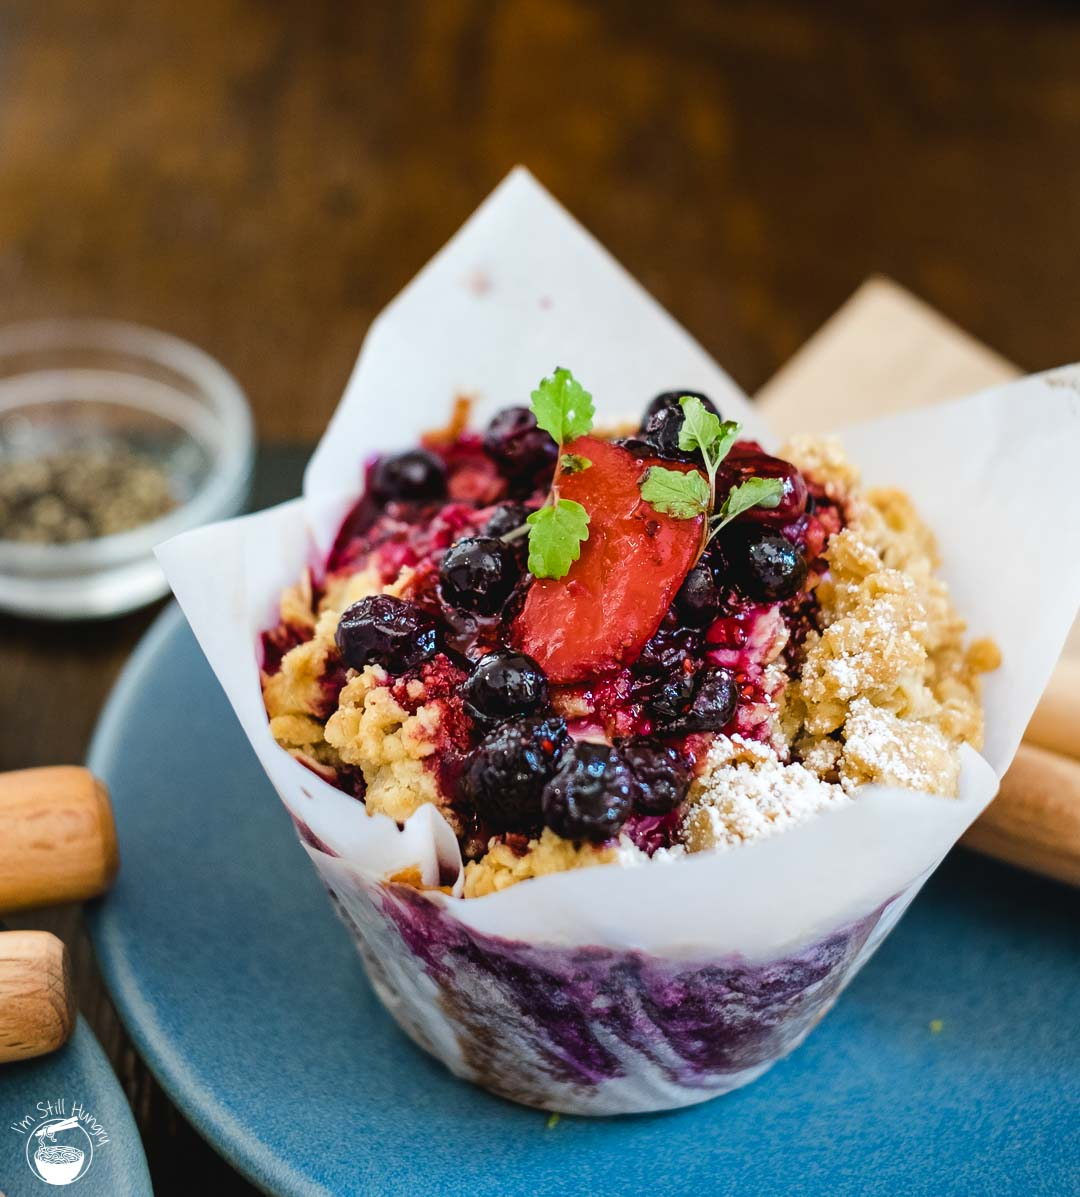 Cafe Kentaro Surry Hills blueberry muffin